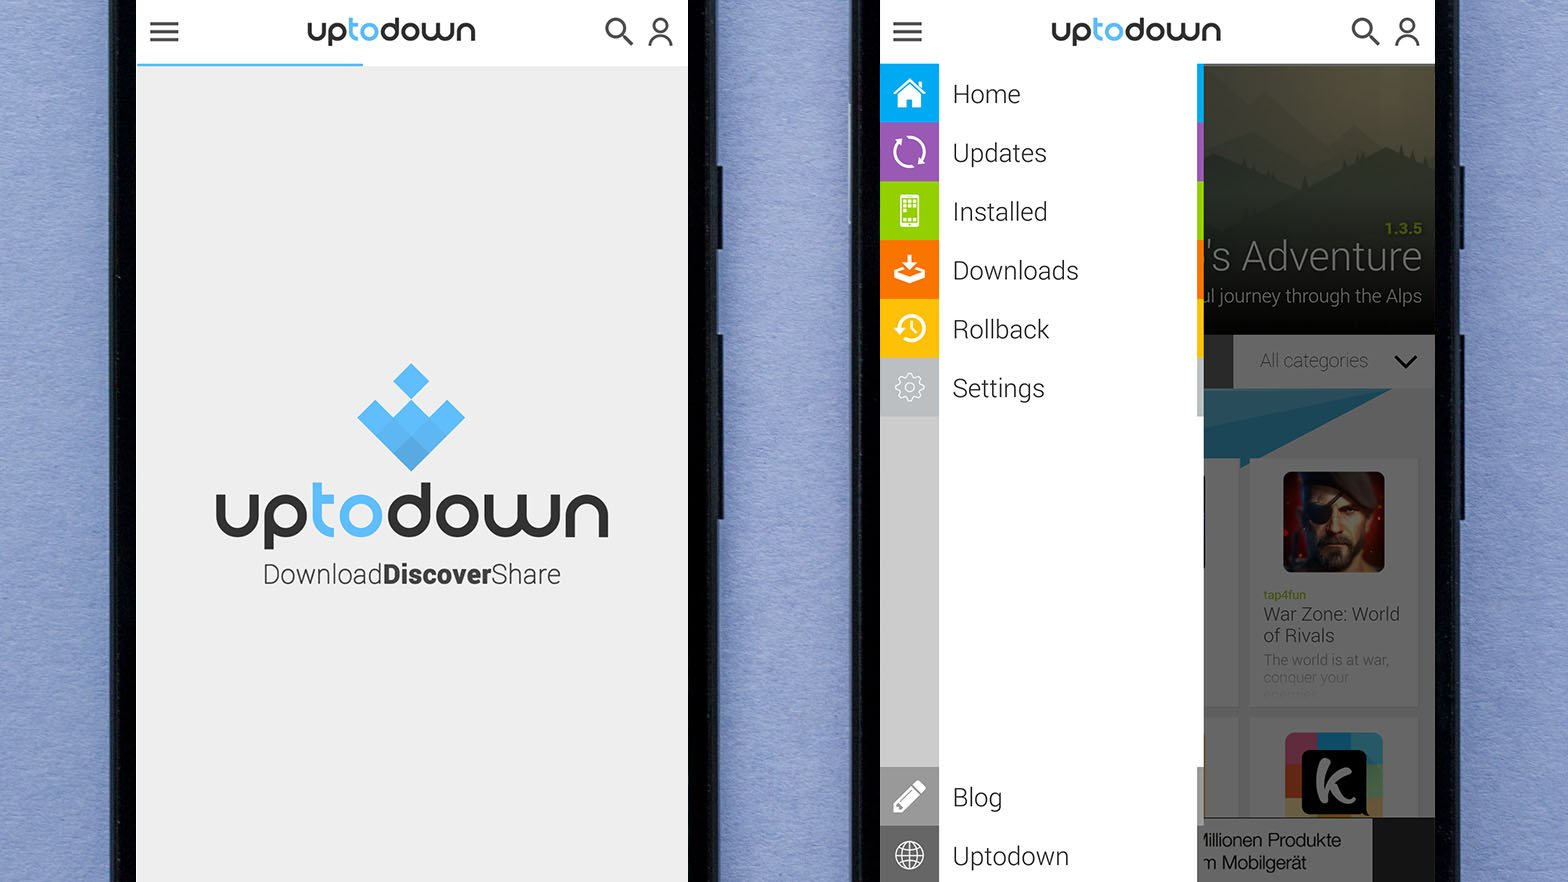 Live Wallpaper App Download Uptodown